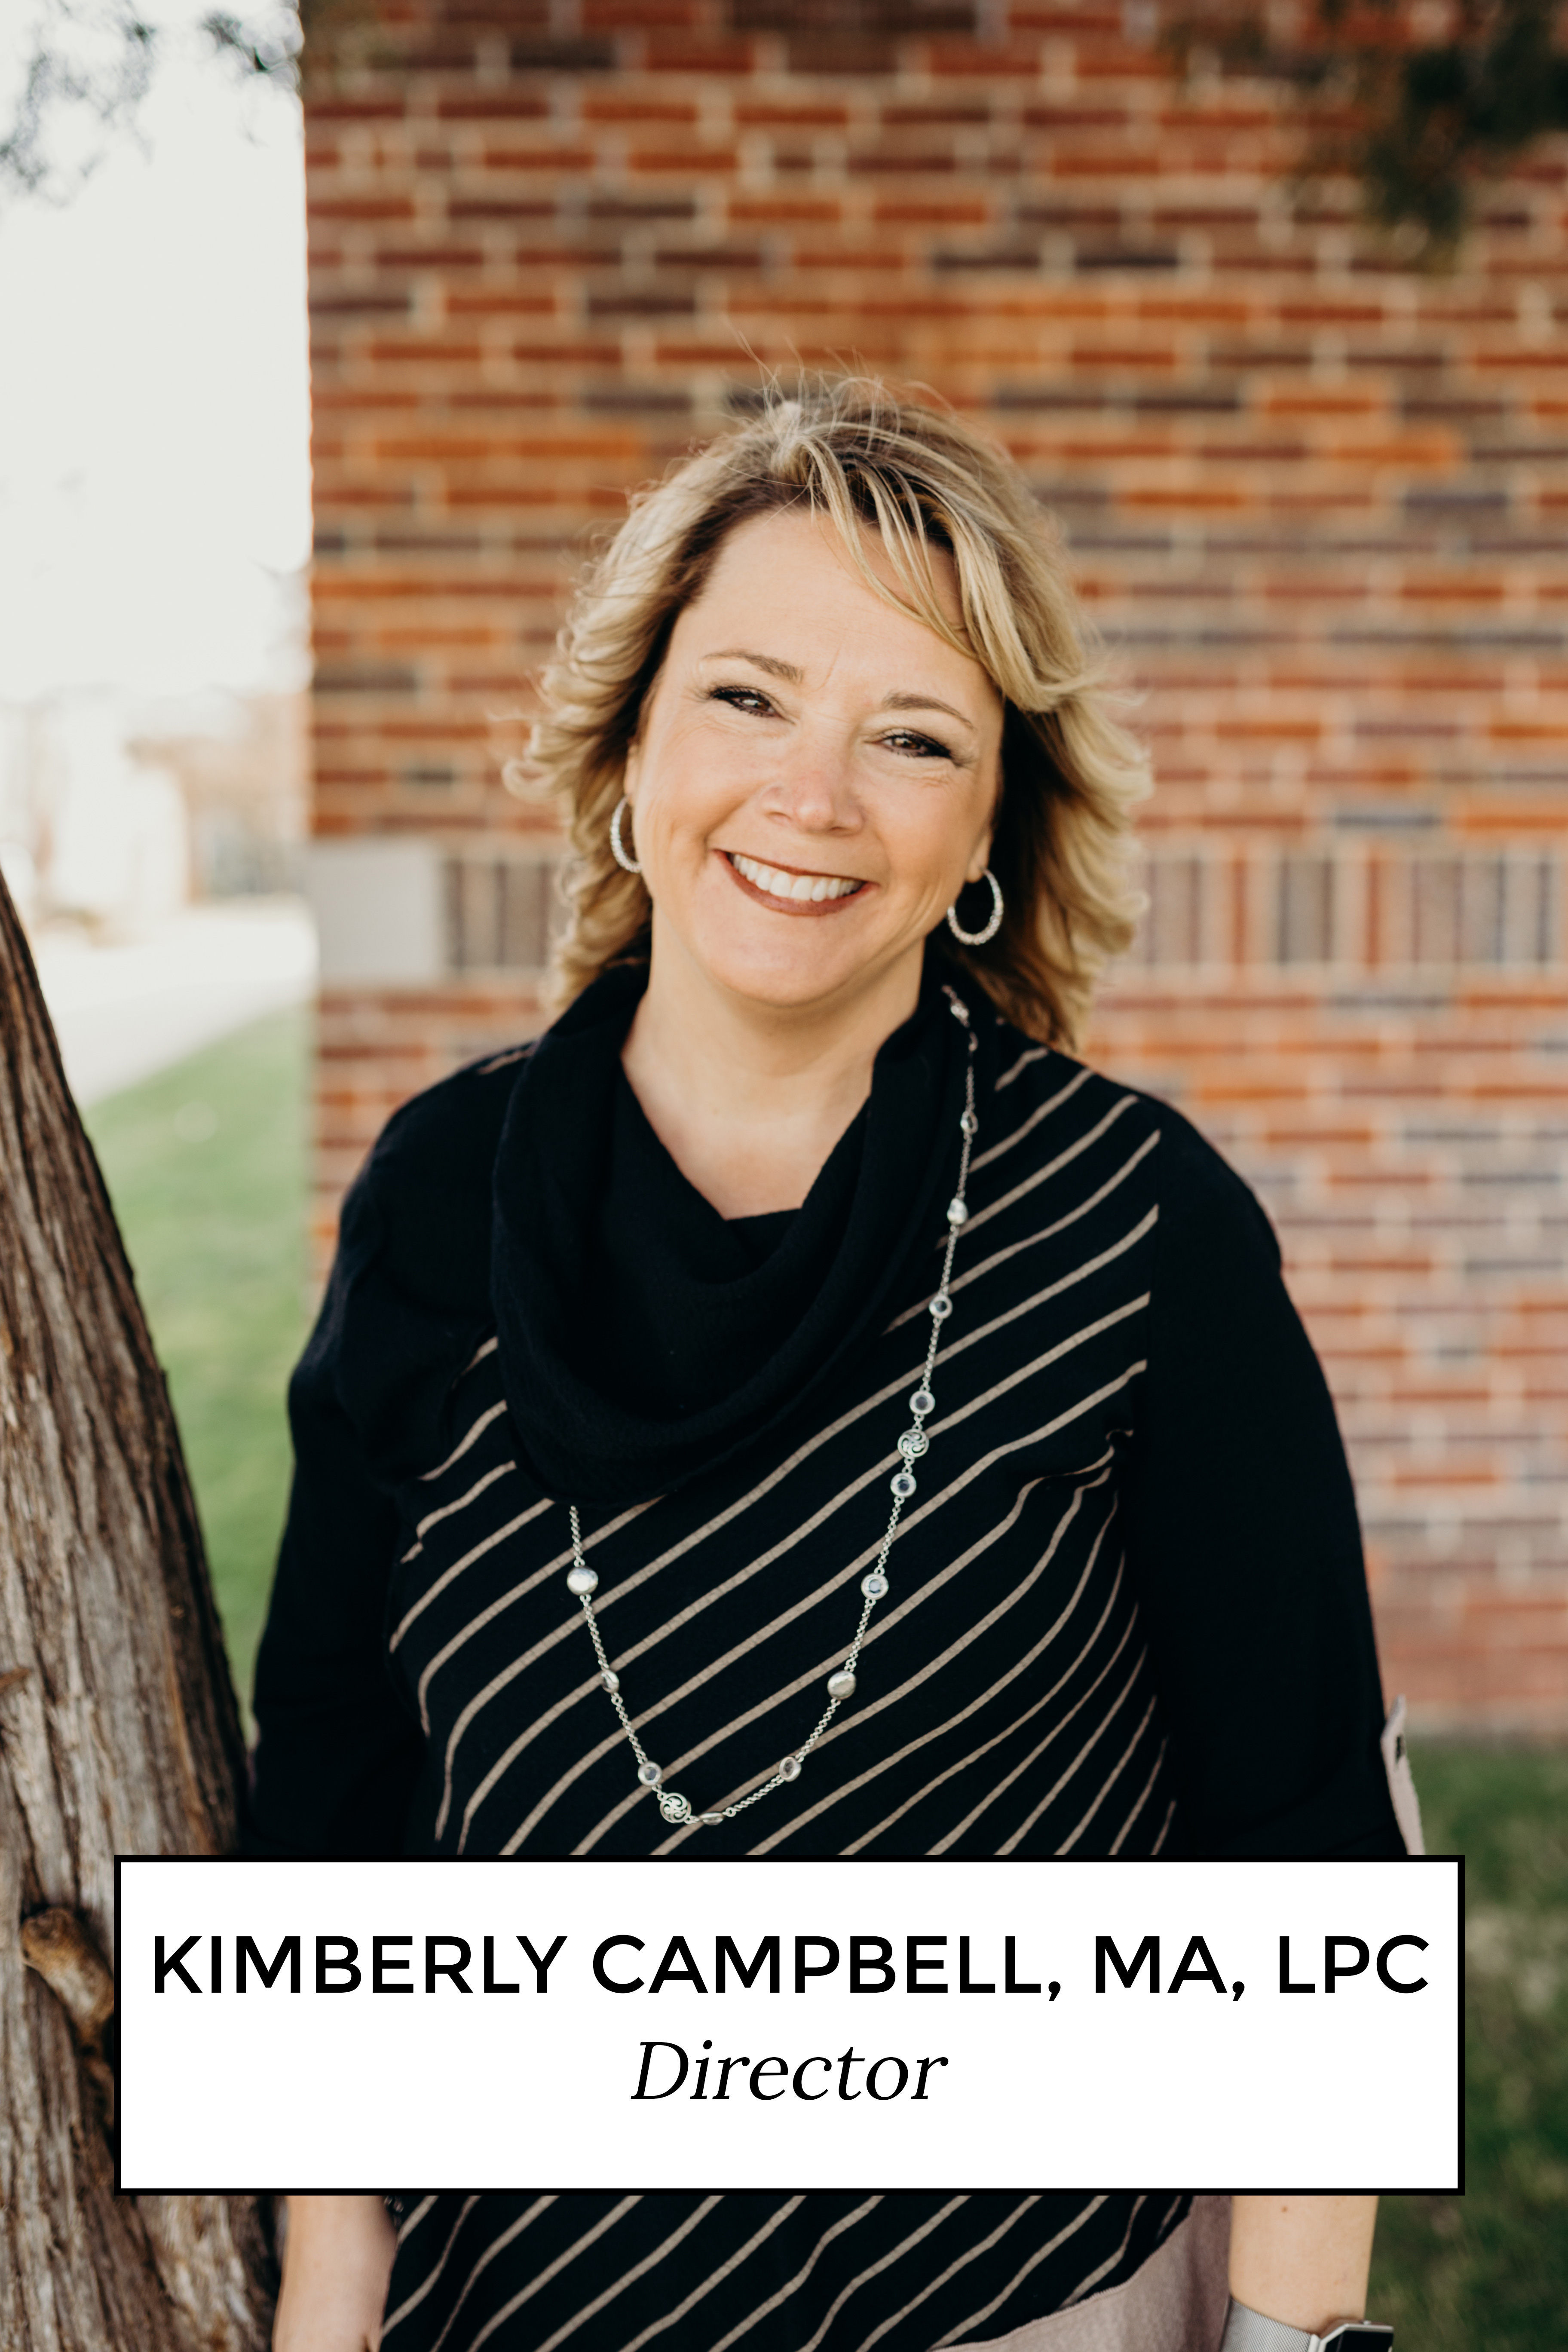 Kimberly Campbell, MA LPC Director